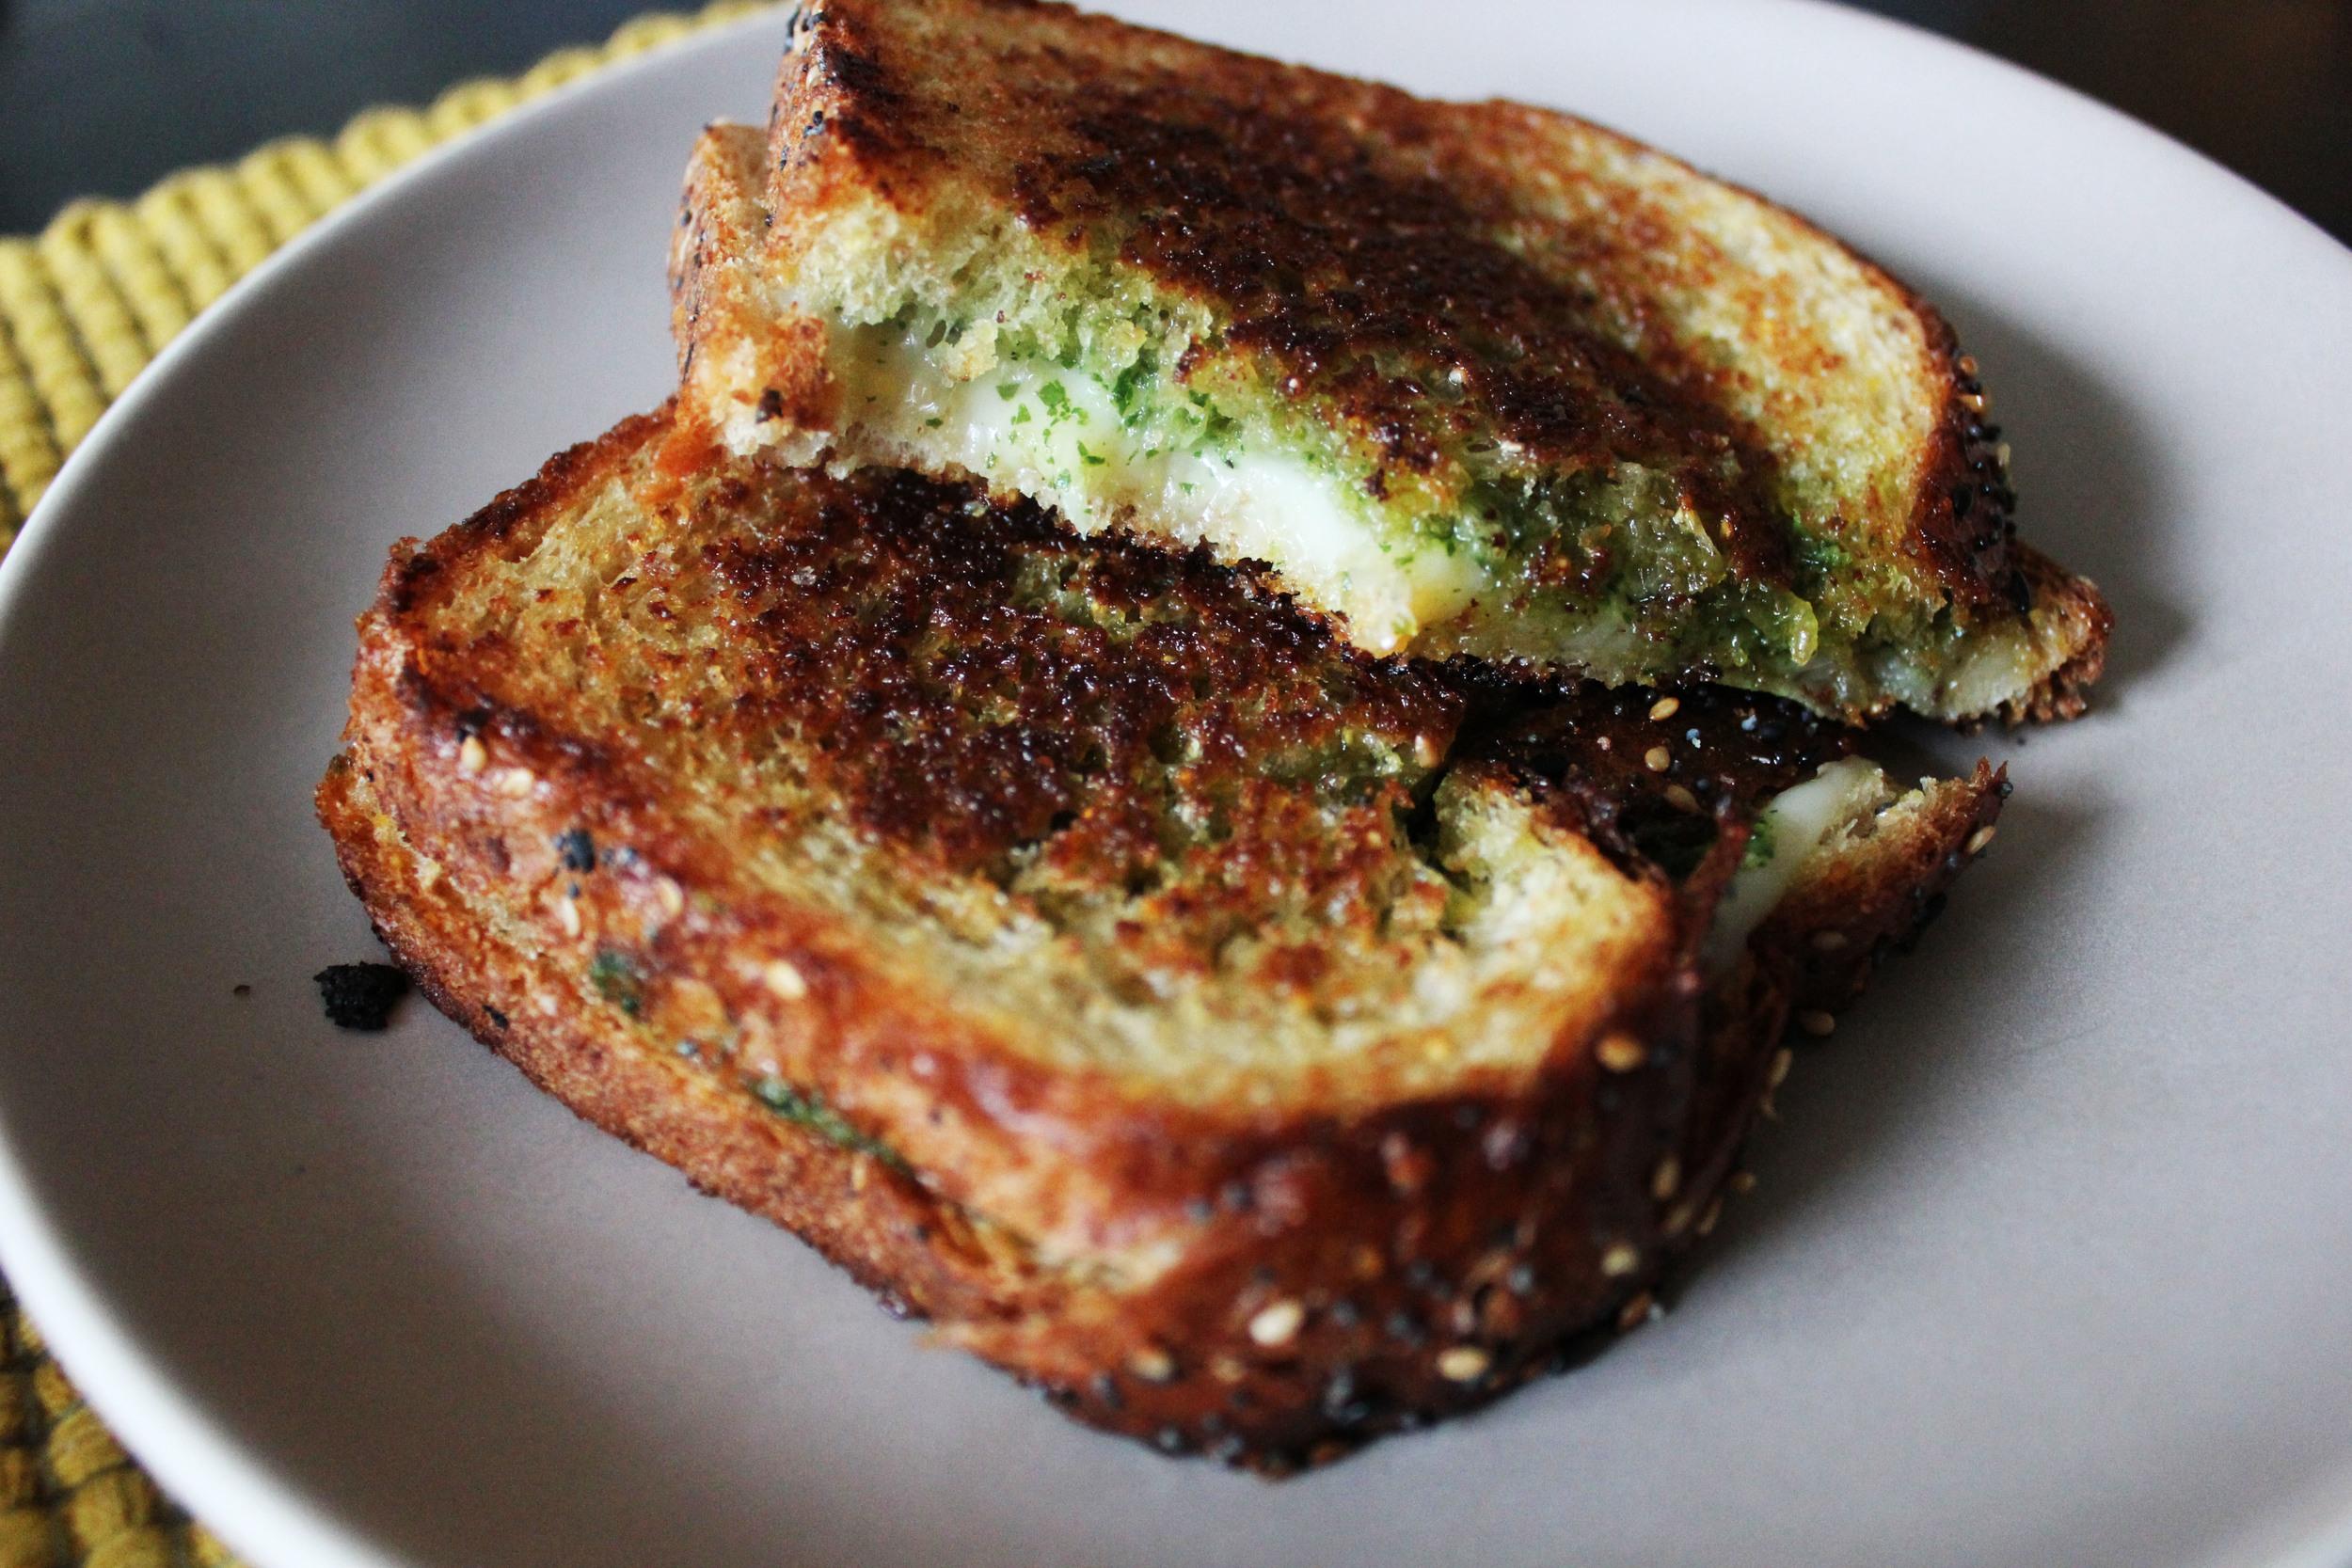 Basil pesto grilled cheese sandwich